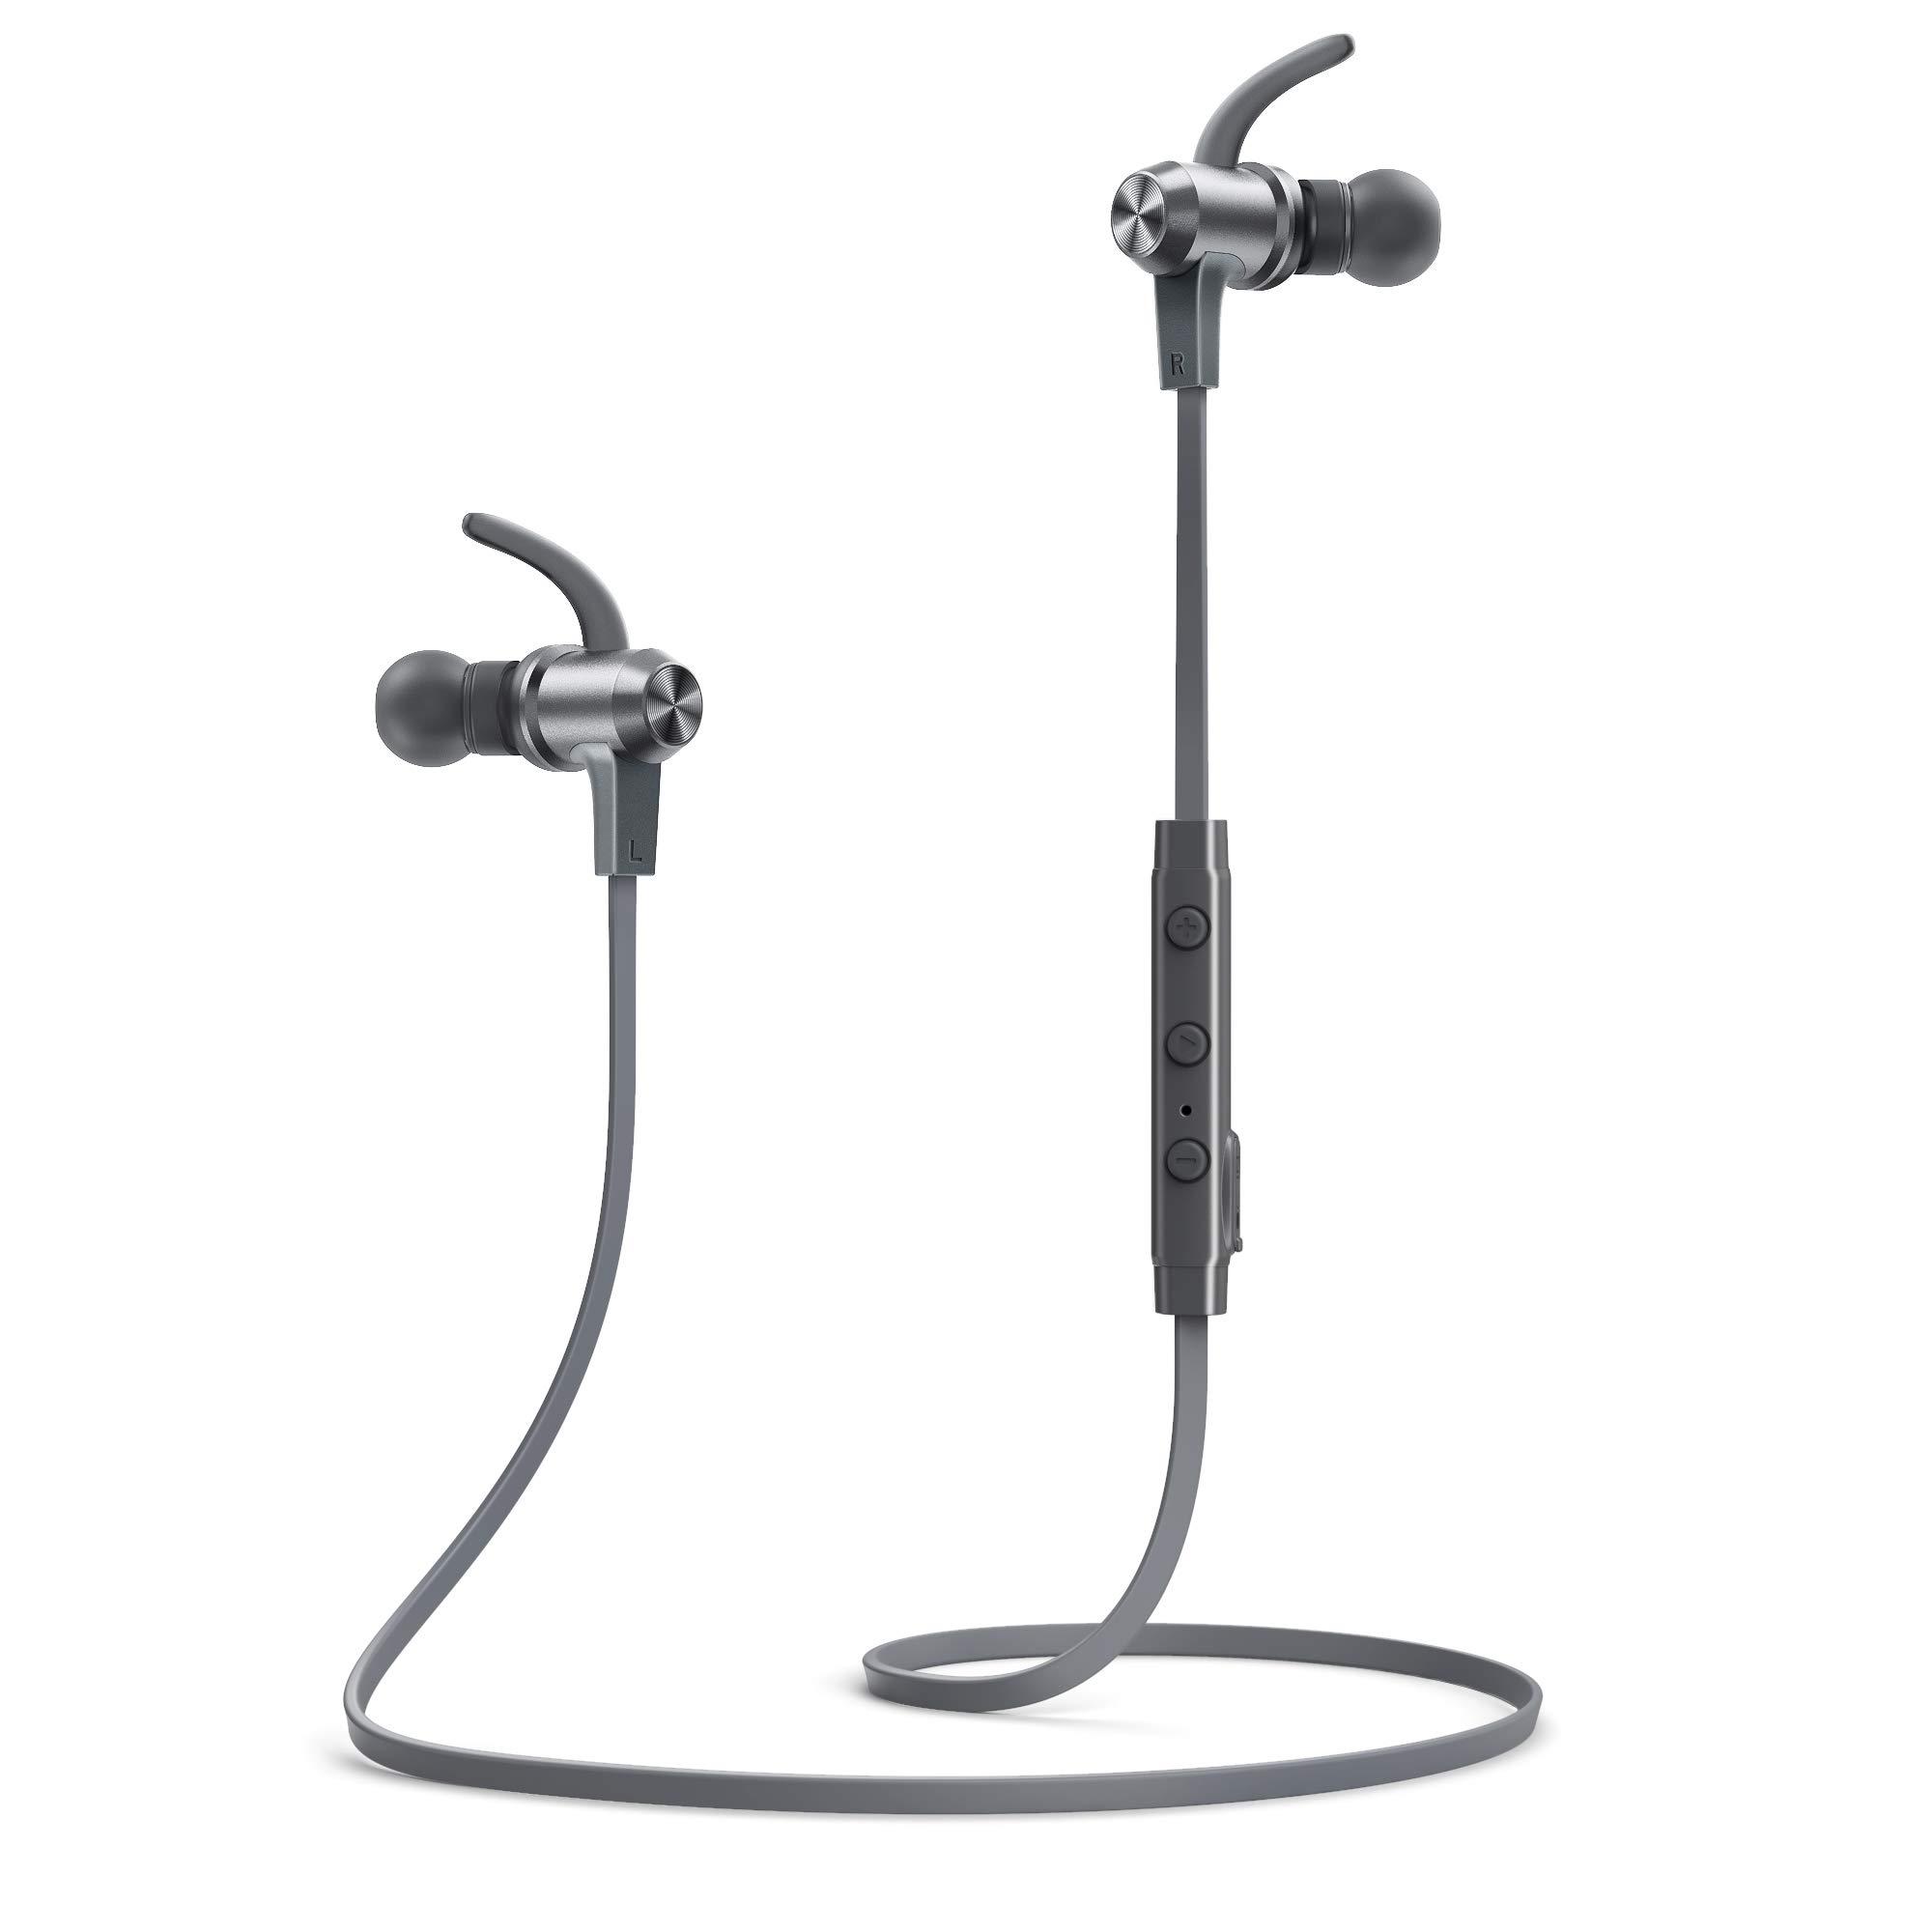 TaoTronics Bluetooth Headphones Wireless Waterproof